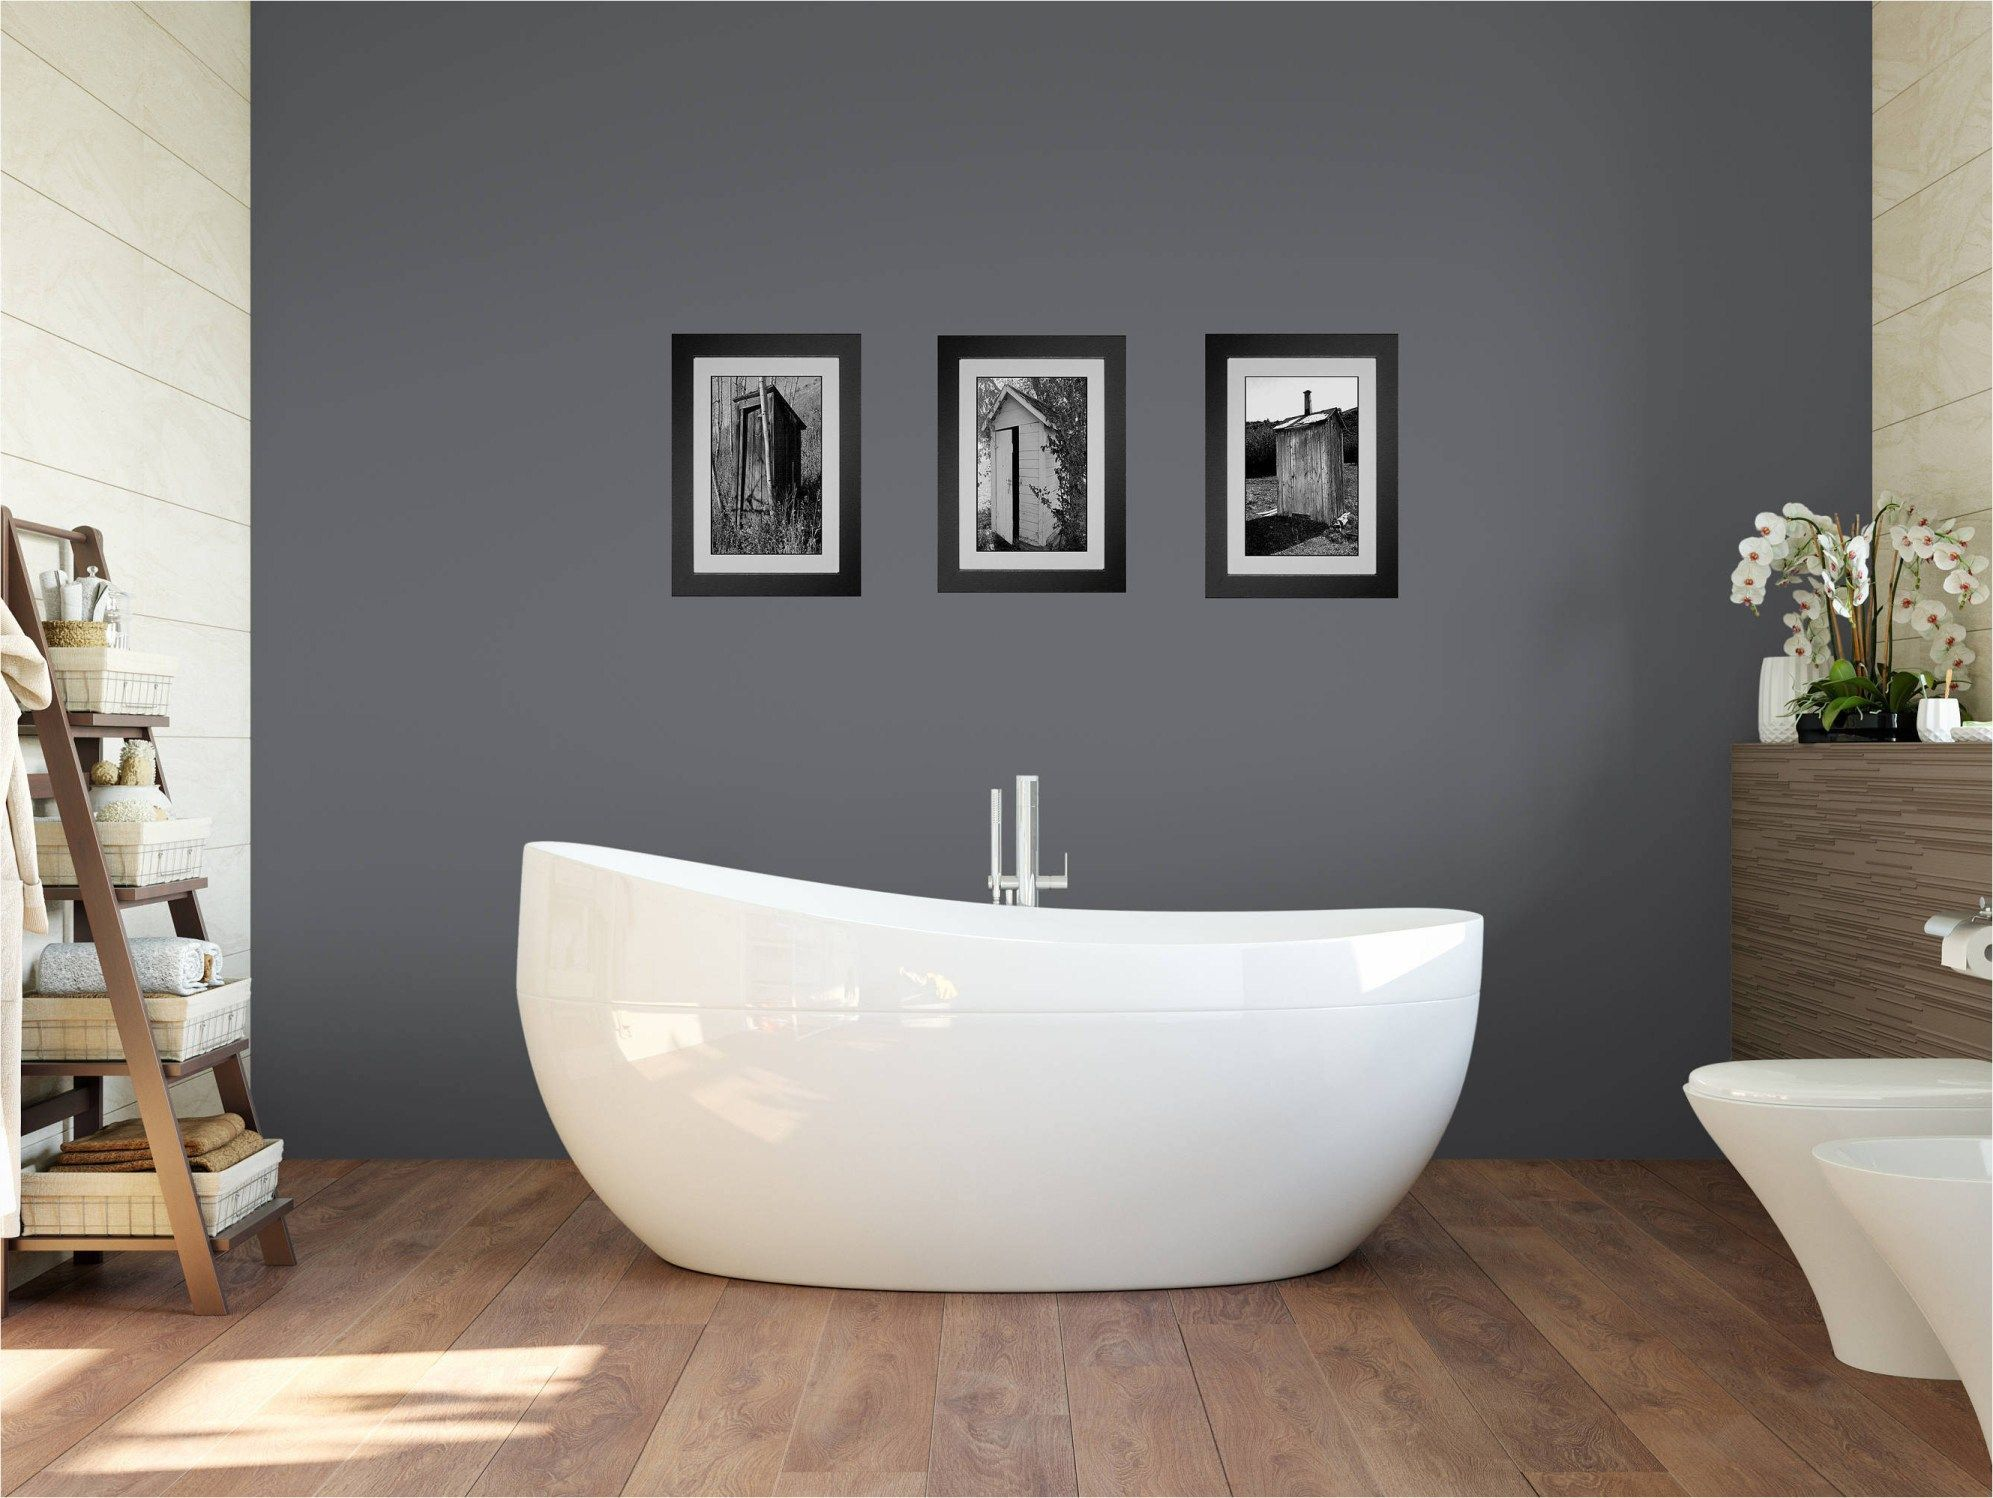 39 Stunning Black And White Bathroom Art Modern Bathroom Wall